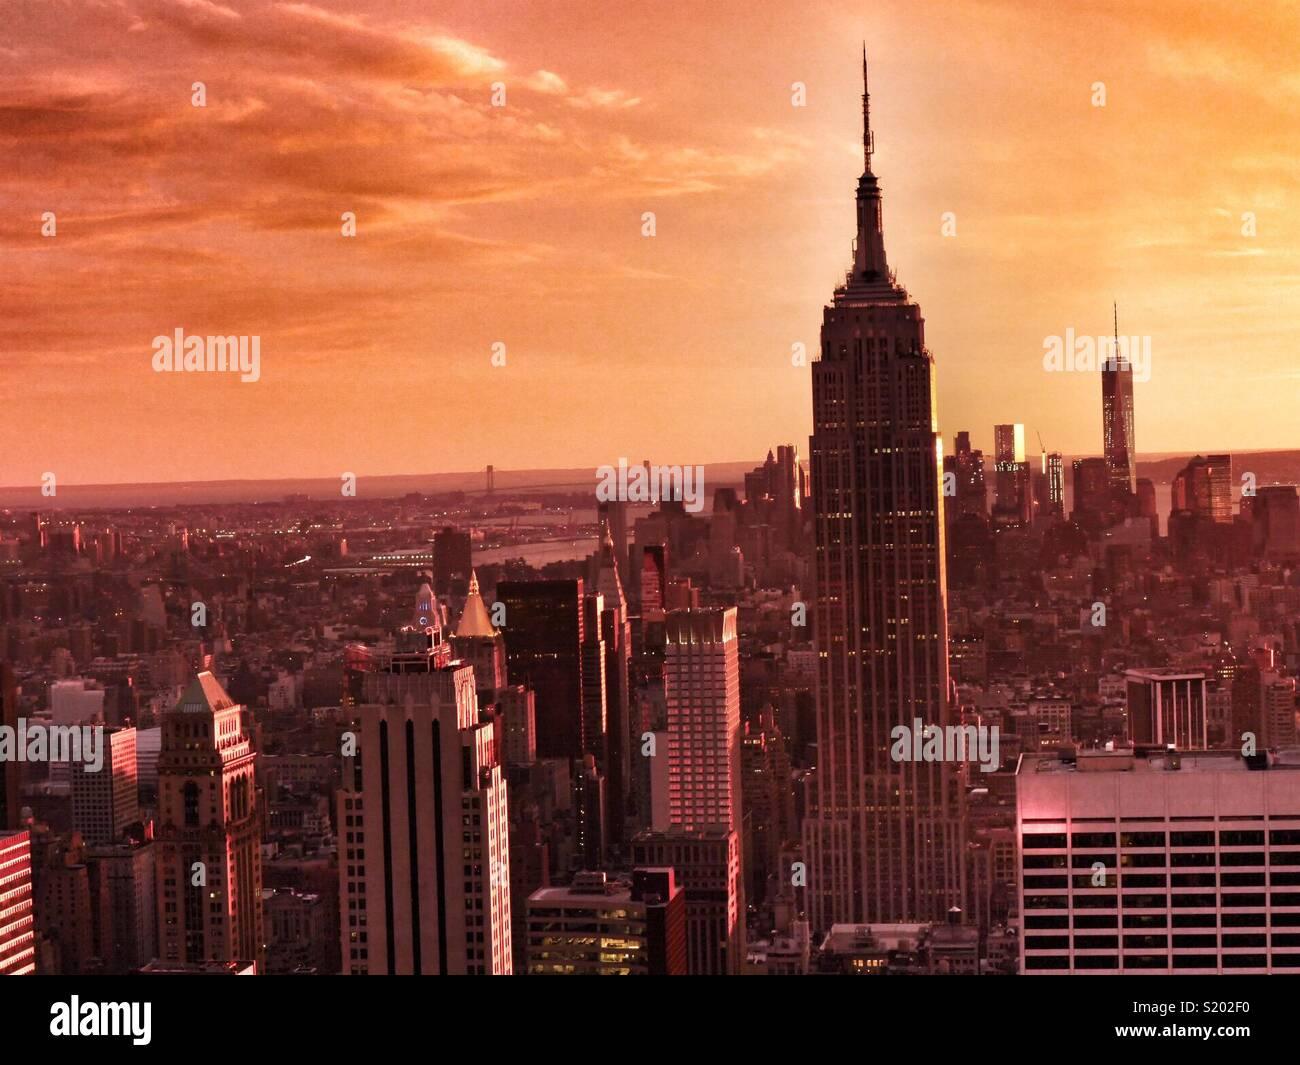 New York skyline at sunset, New York City, USA Stock Photo